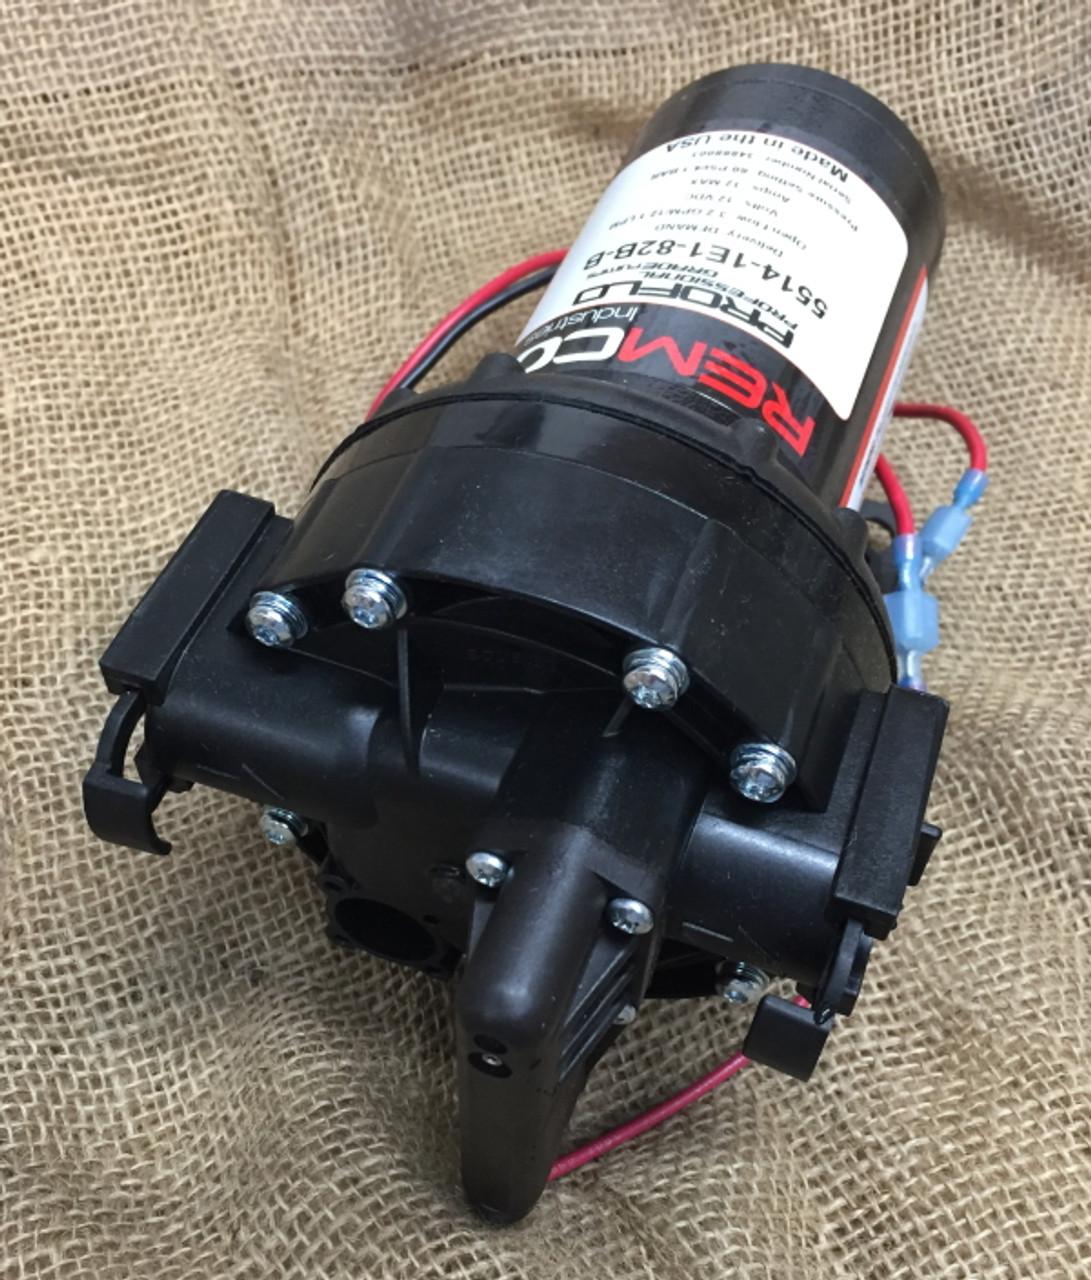 Remco automatic 12v DC pressure pump model 5514-1E1-82B no 2.